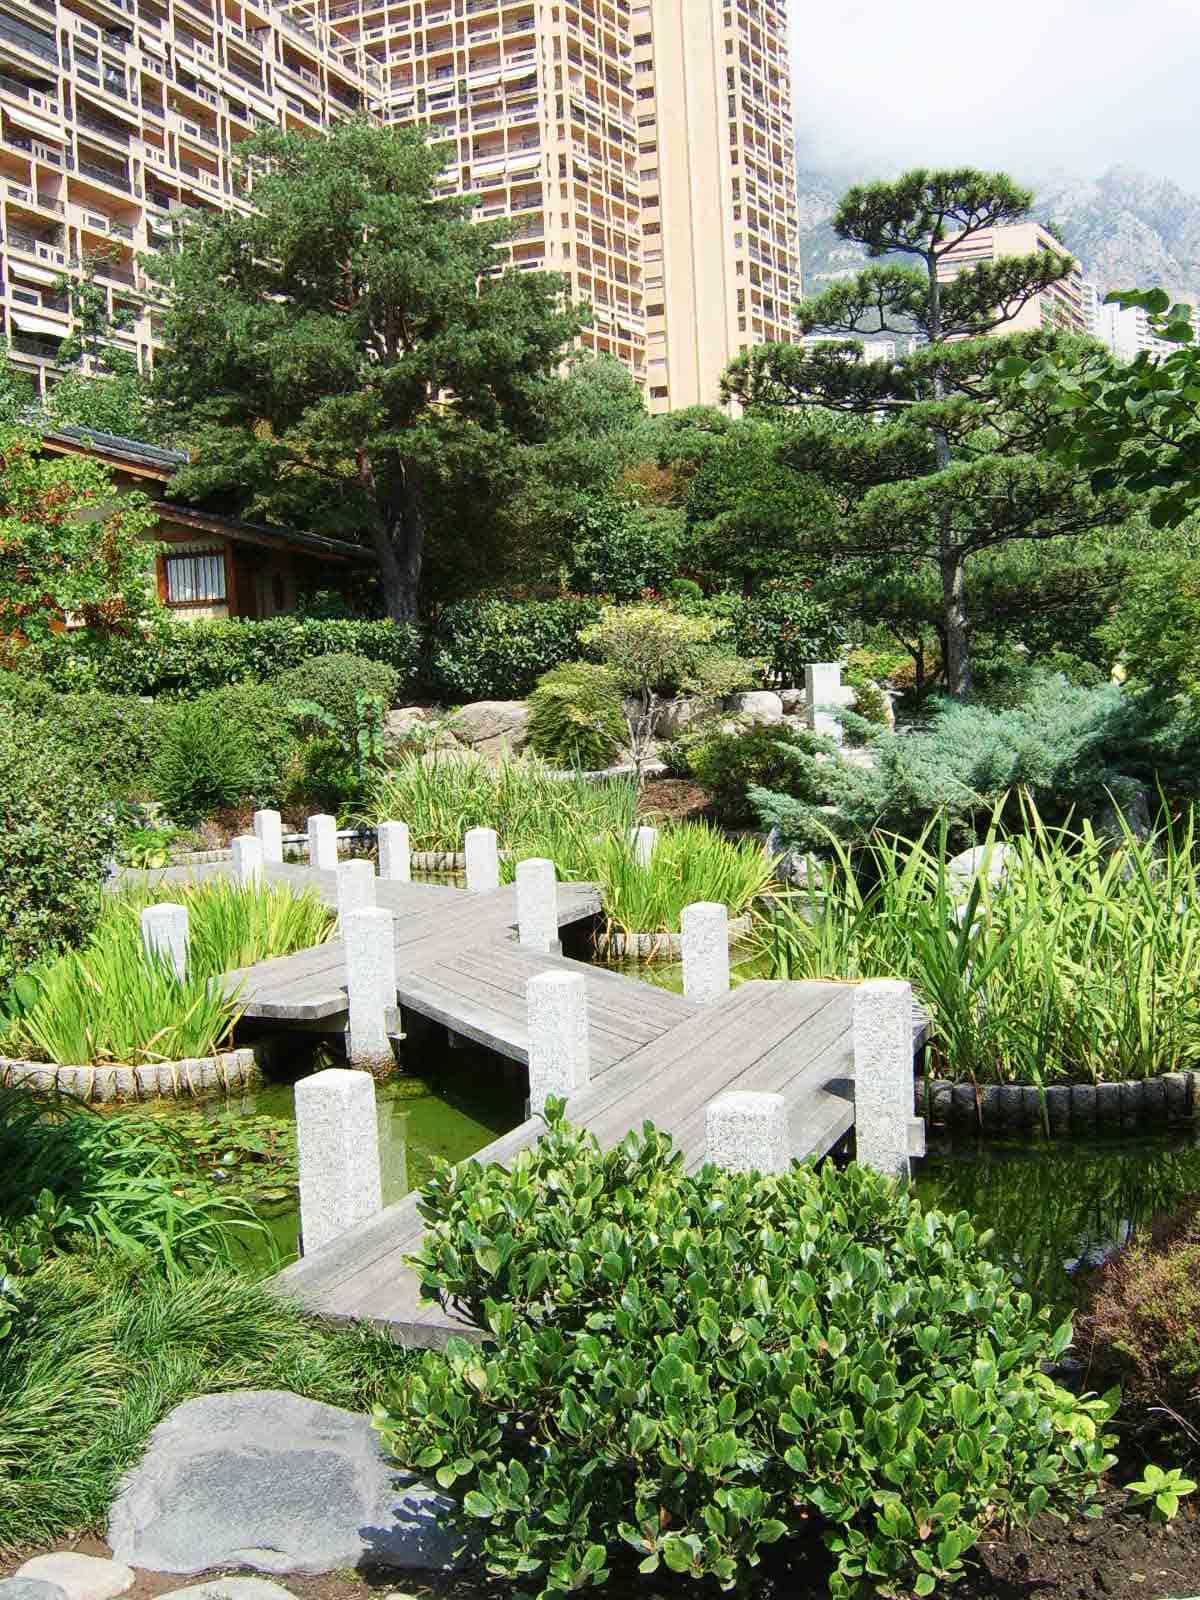 Giardino Zen Architettura : Giardino giapponese creareverde creare verde